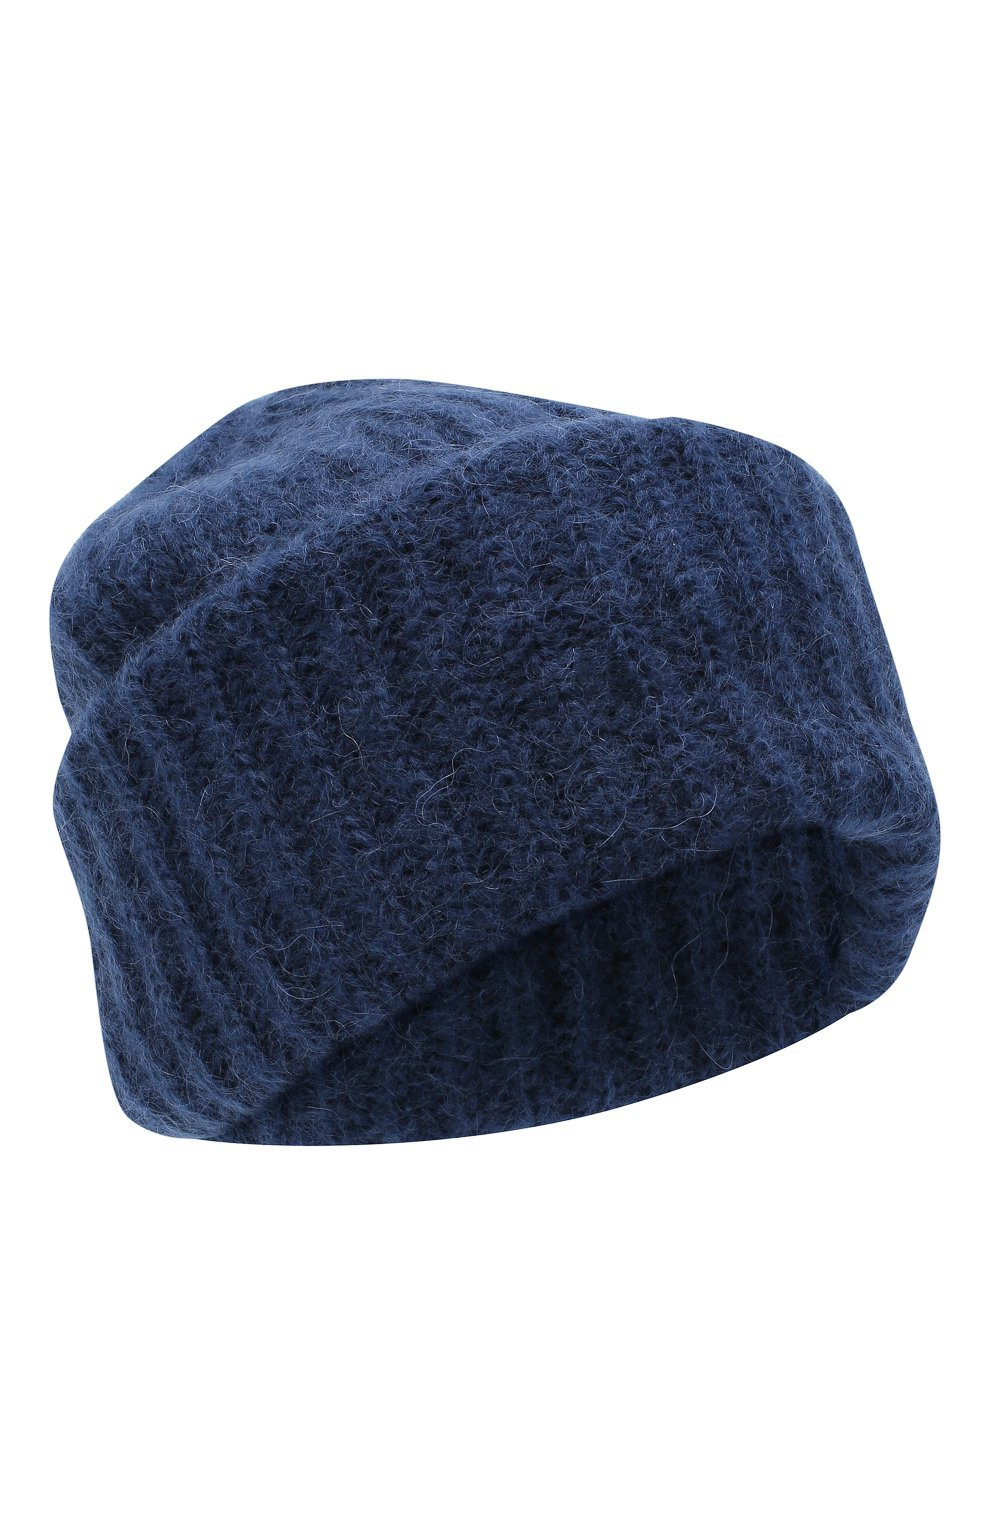 Женская шапка TAK.ORI темно-синего цвета, арт. AC043MW018PF17 | Фото 1 (Материал: Текстиль, Шерсть, Синтетический материал)